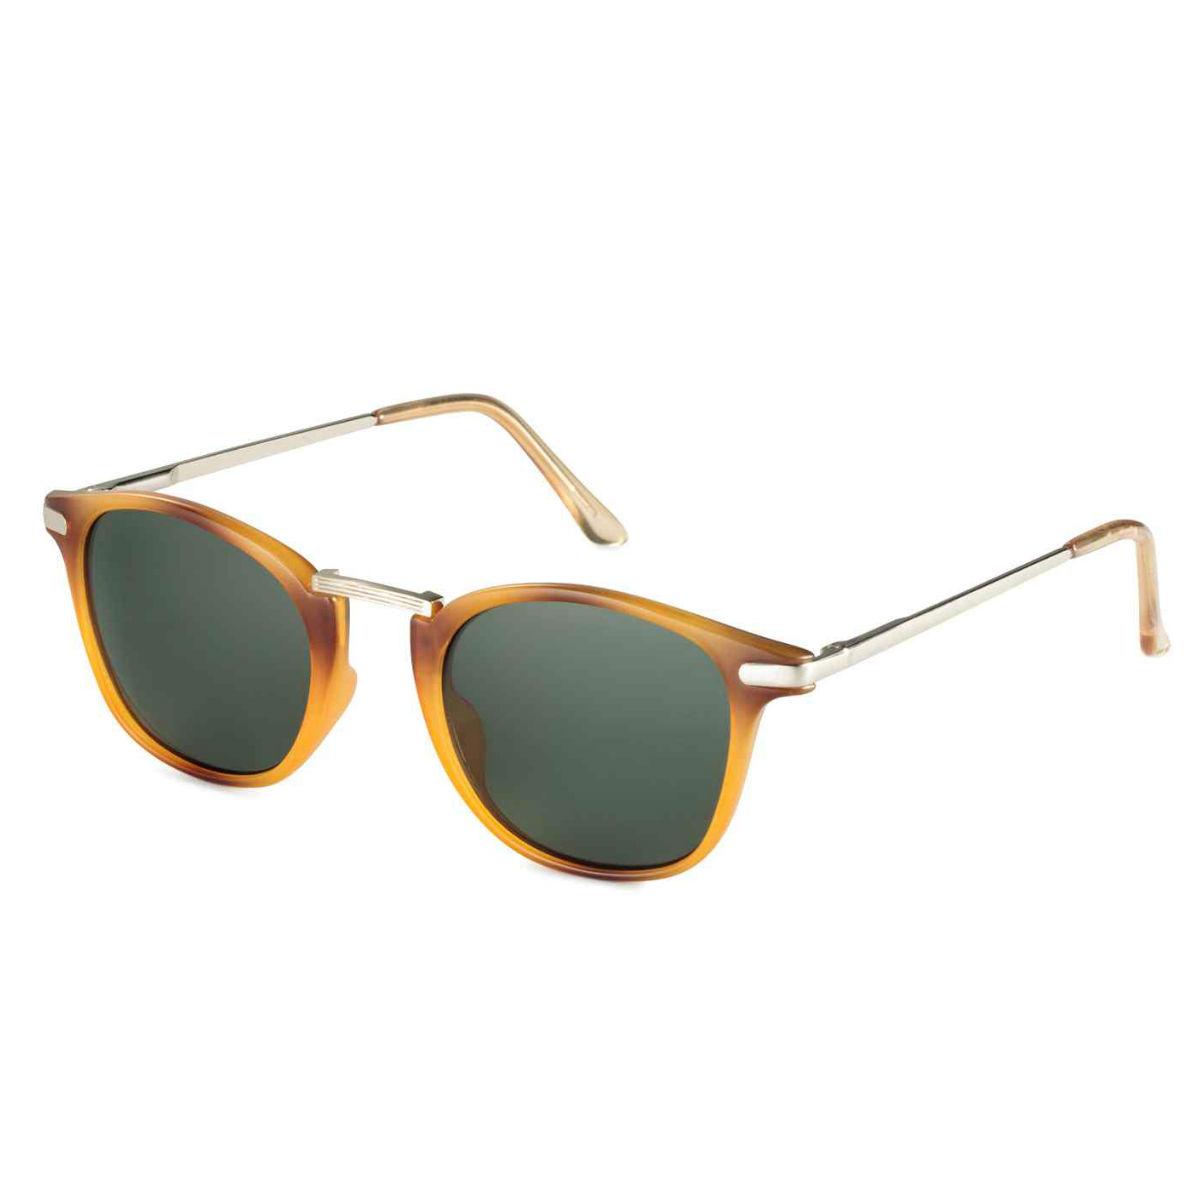 Sunglasses, £6.99, H&M